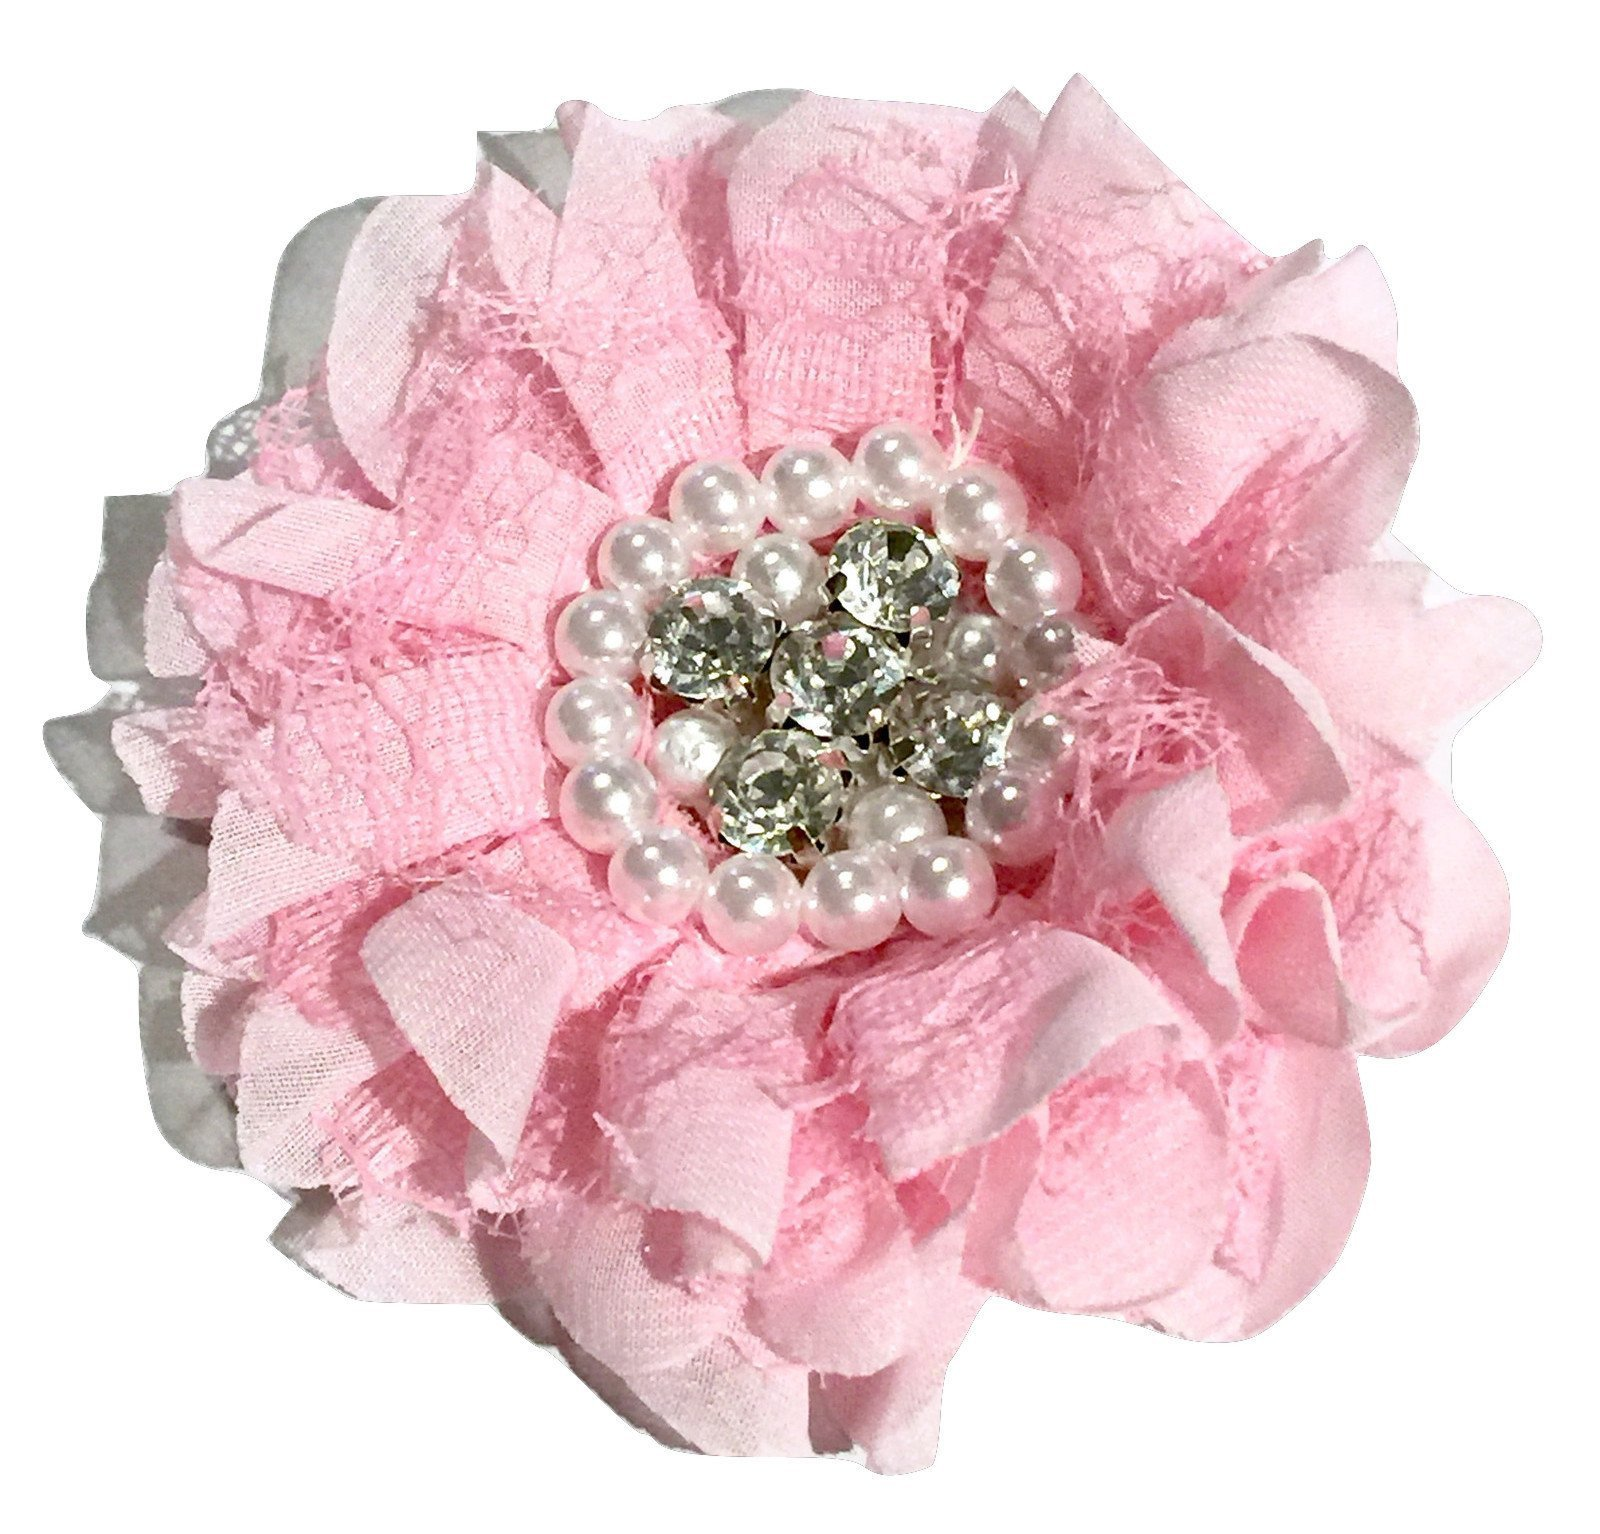 "Naavy blue 3.5/"" lace chiffon ruffle flower w// rhinestone /& pearl center"